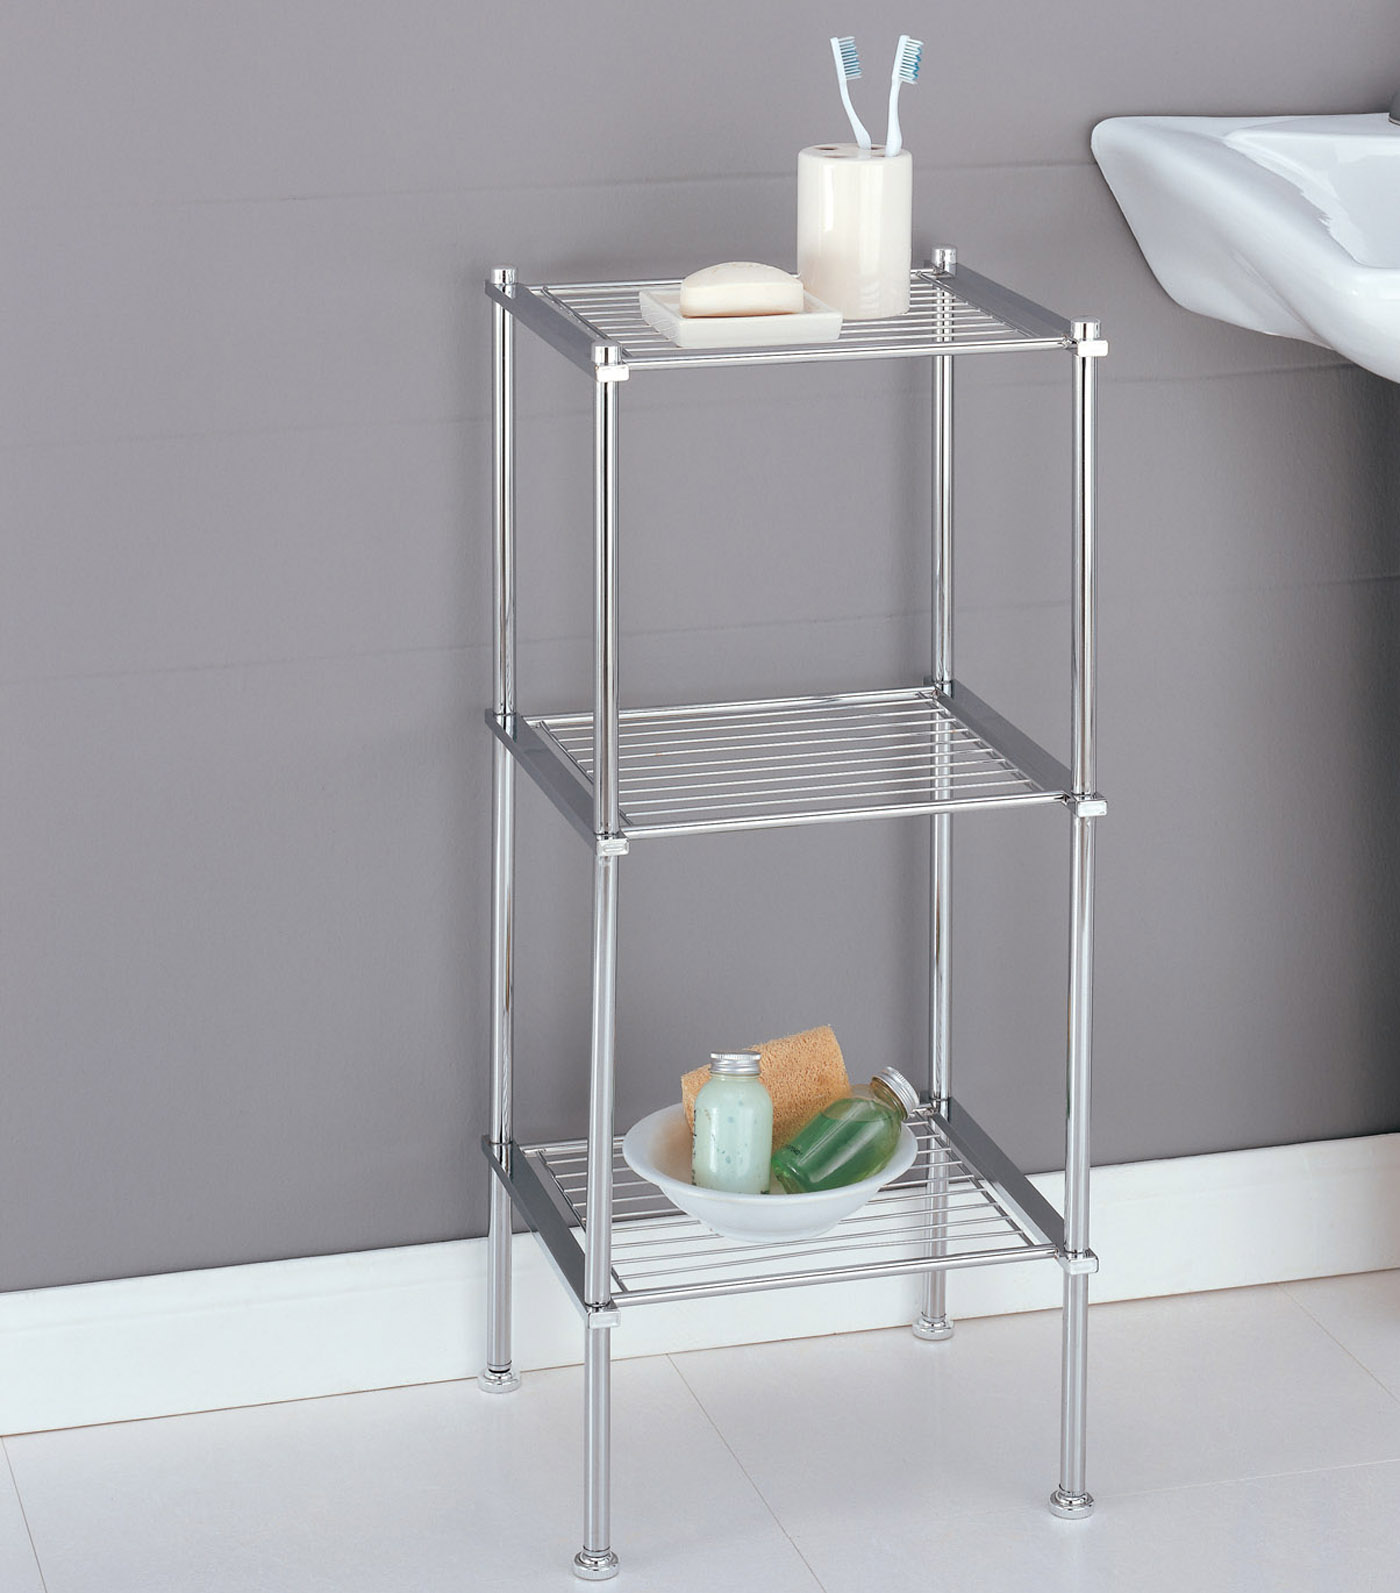 Three Tier Storage Shelf In Bathroom Shelves